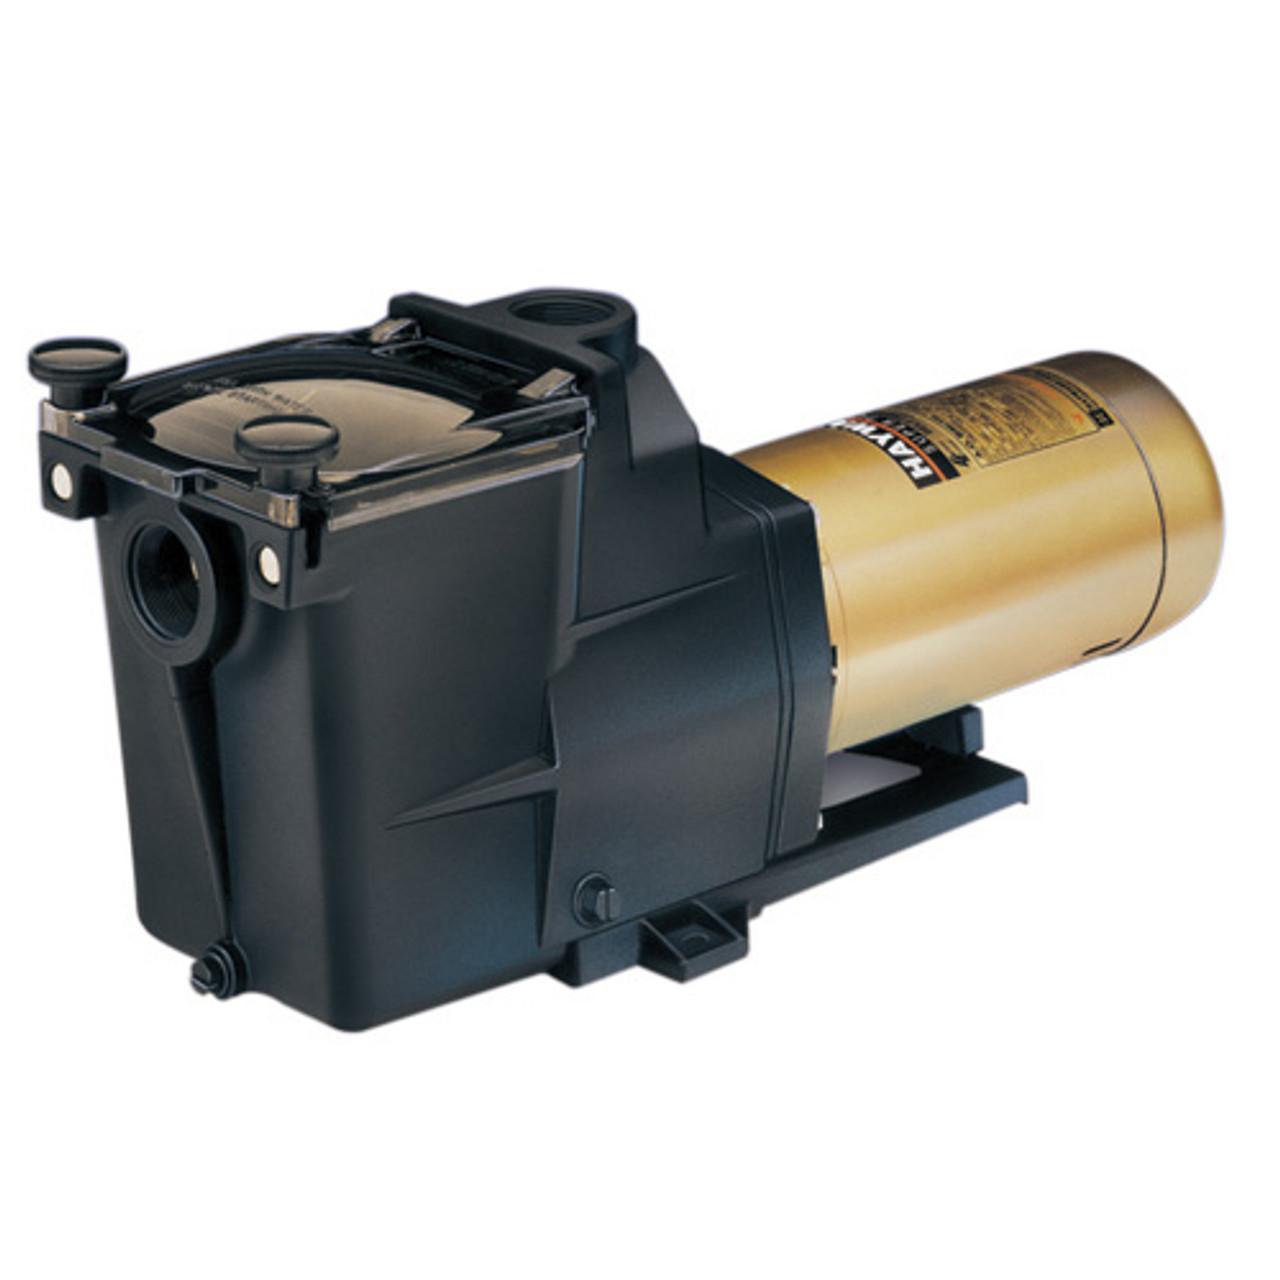 Hayward Super Pump 1.5 HP